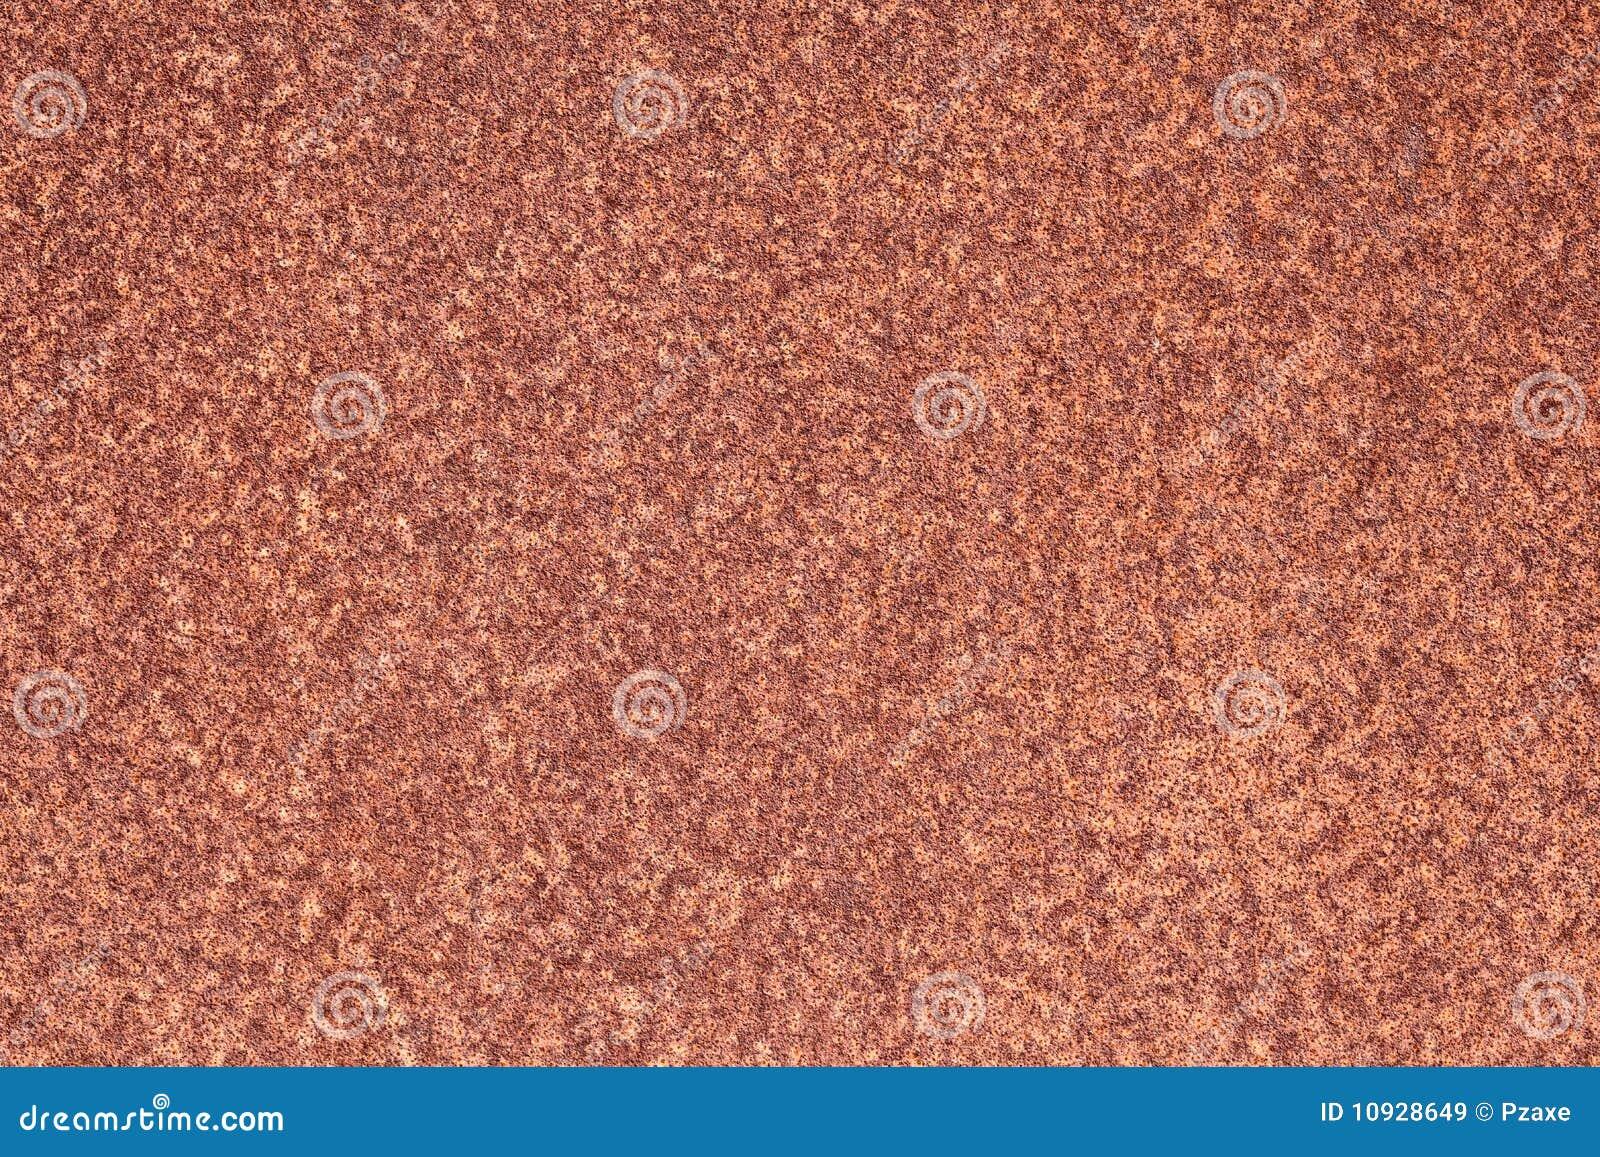 текстура листа утюга корозии ржавая